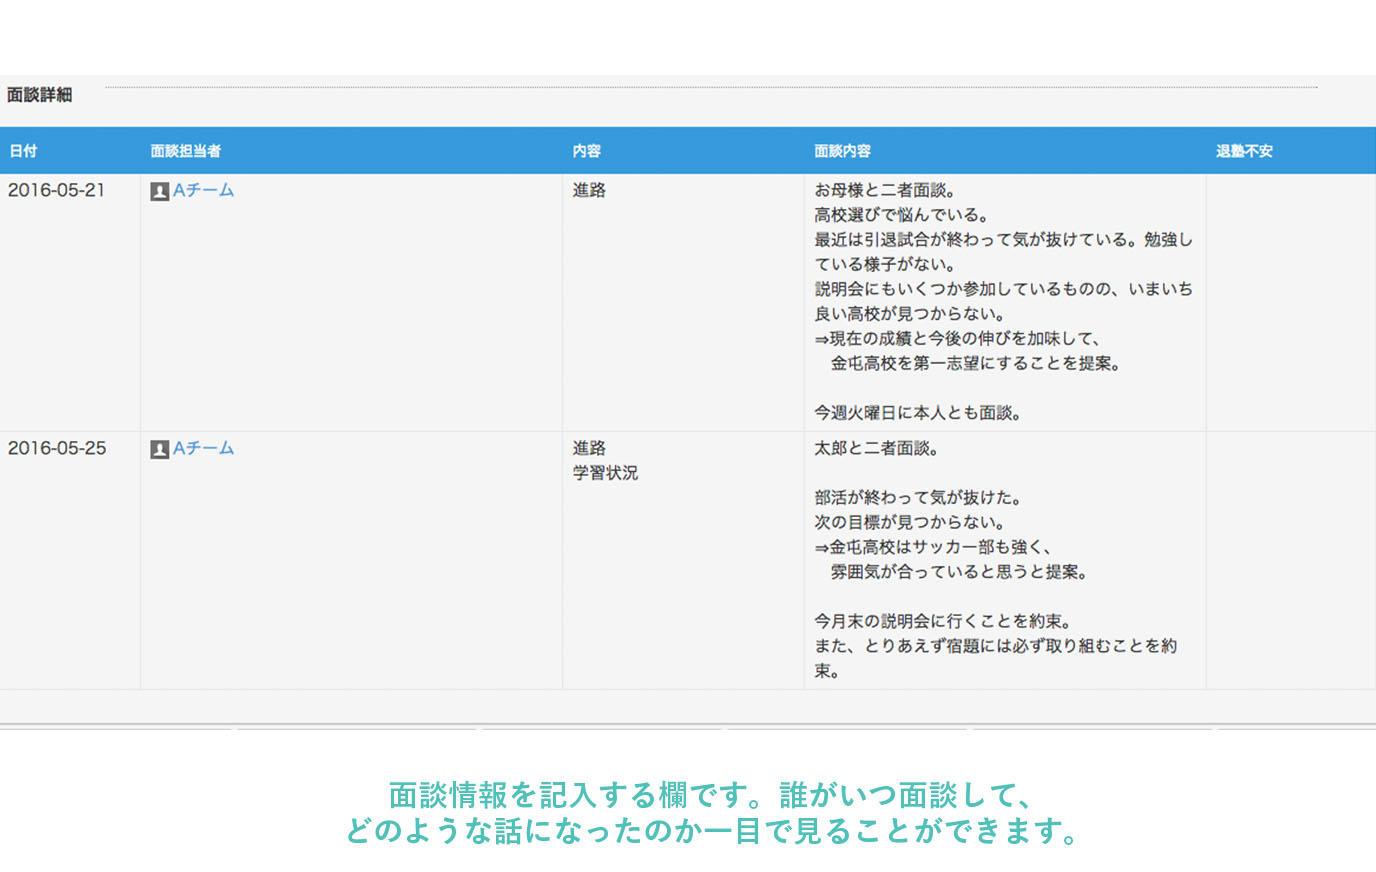 gakusyuujyuku_03.jpg